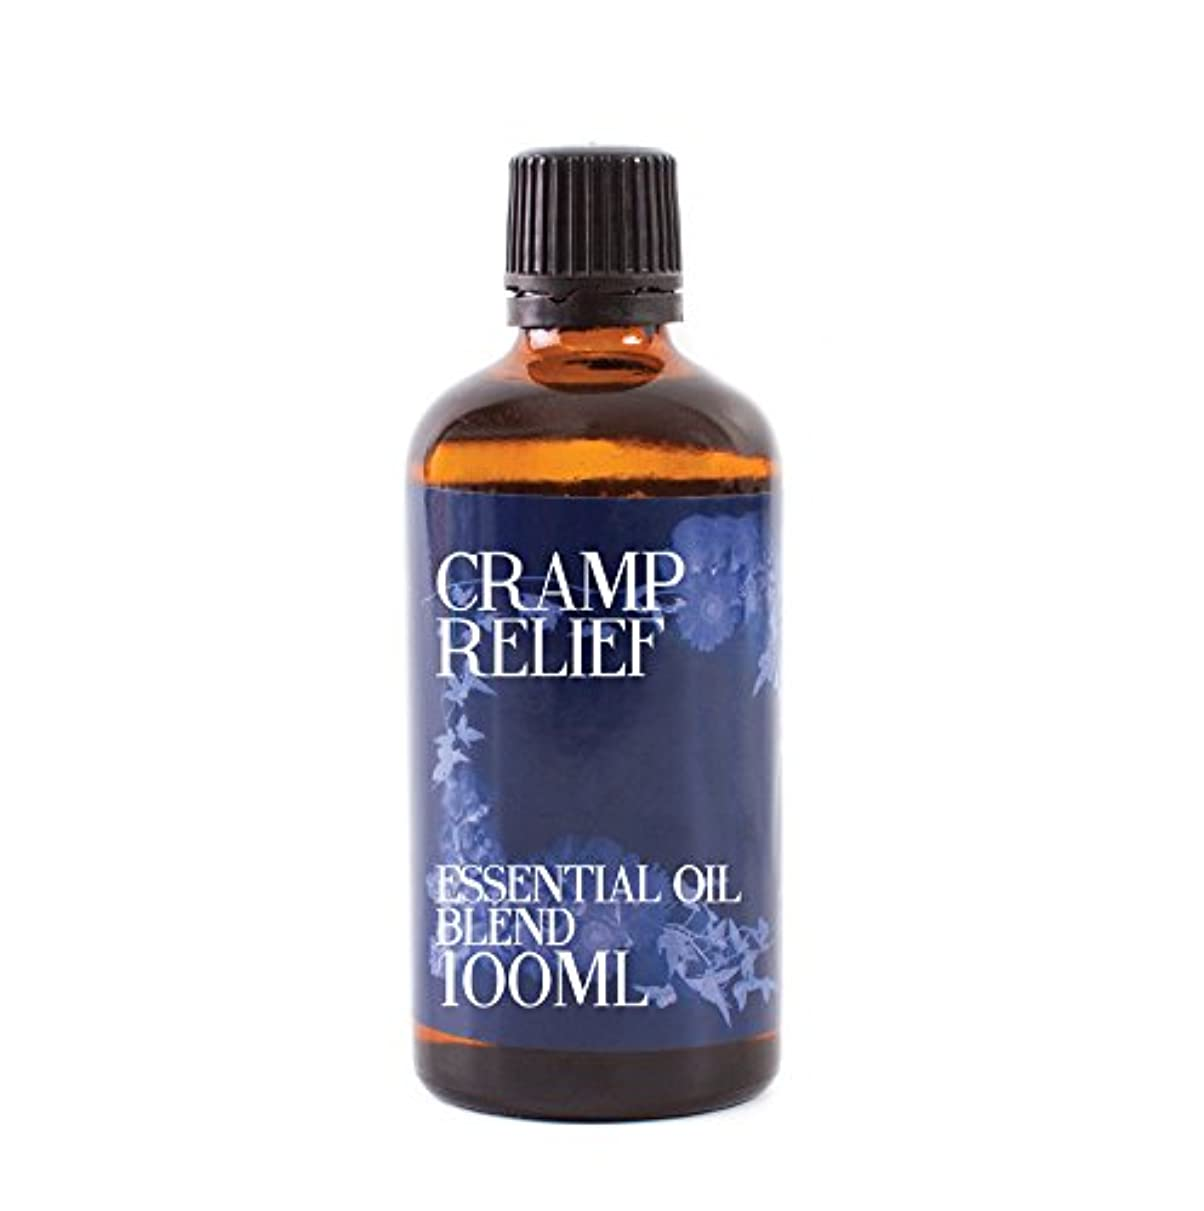 不振収束する八百屋Mystix London   Cramp Relief Essential Oil Blend - 100ml - 100% Pure